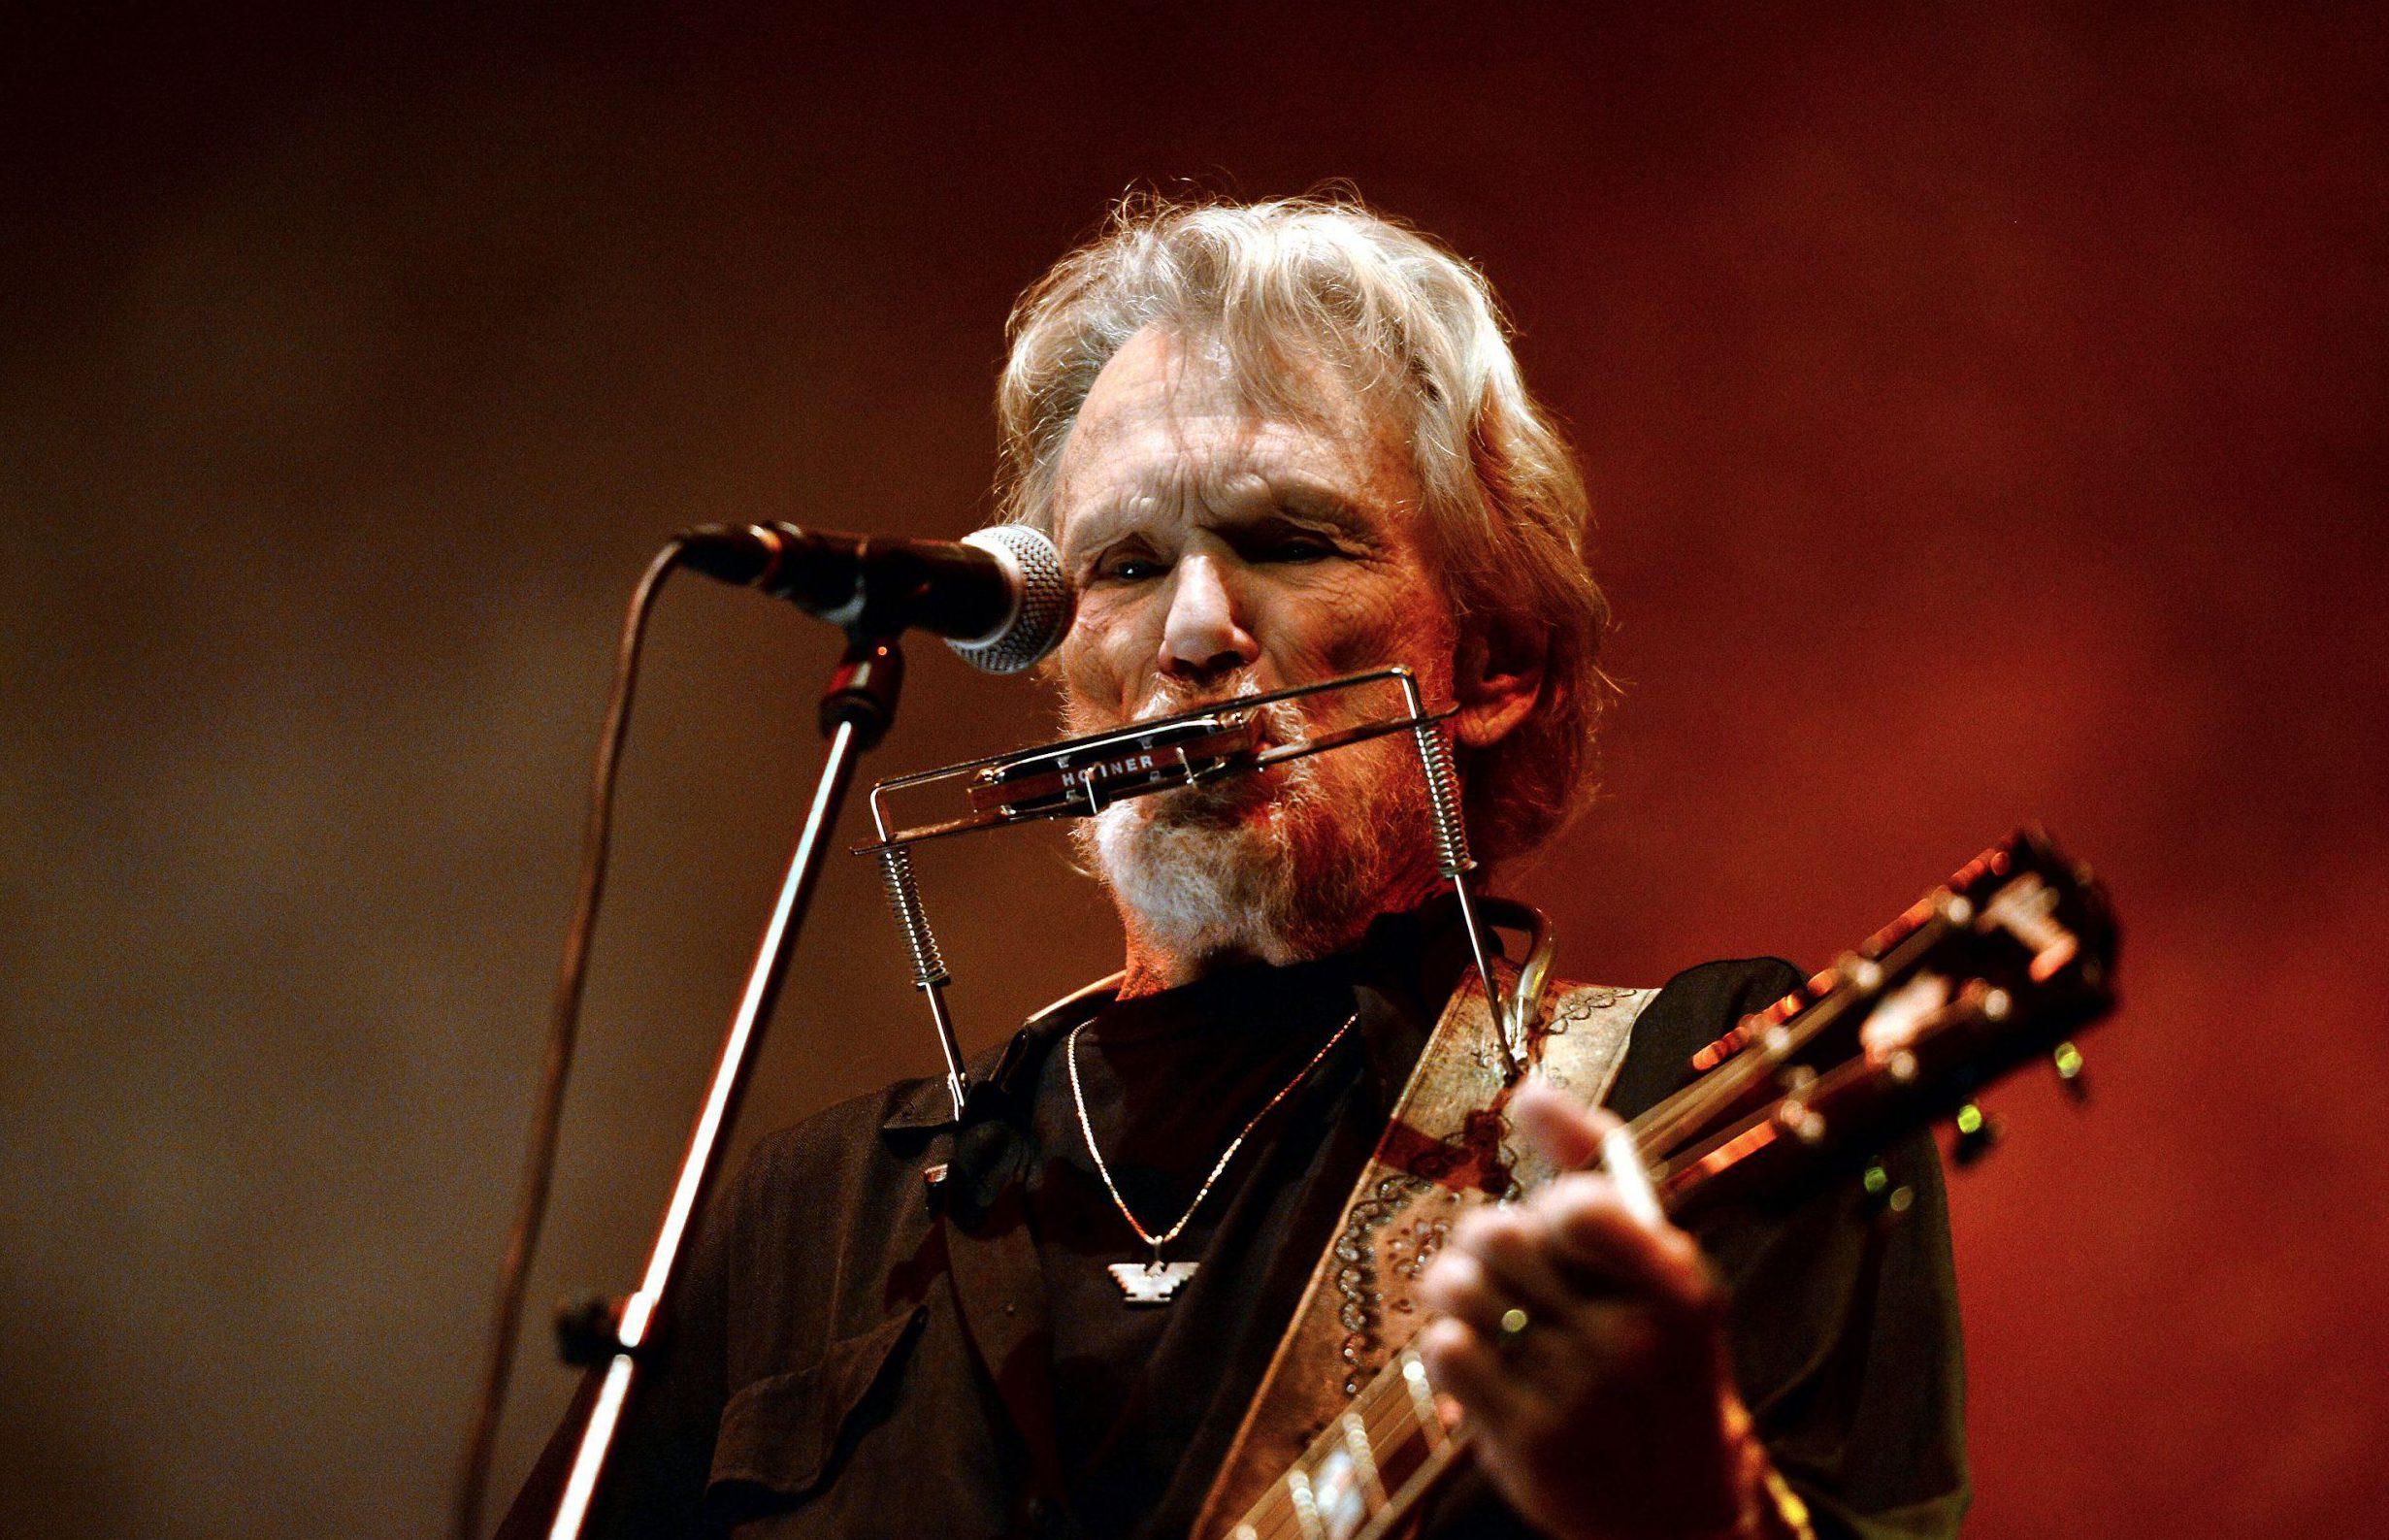 Mandatory Credit: Photo by Anita Russo/REX/Shutterstock (5562610e)nKris KristoffersonnKris Kristofferson in concert, Celtic Connections Festival, Glasgow, Scotland, Britain - 23 Jan 2016nn